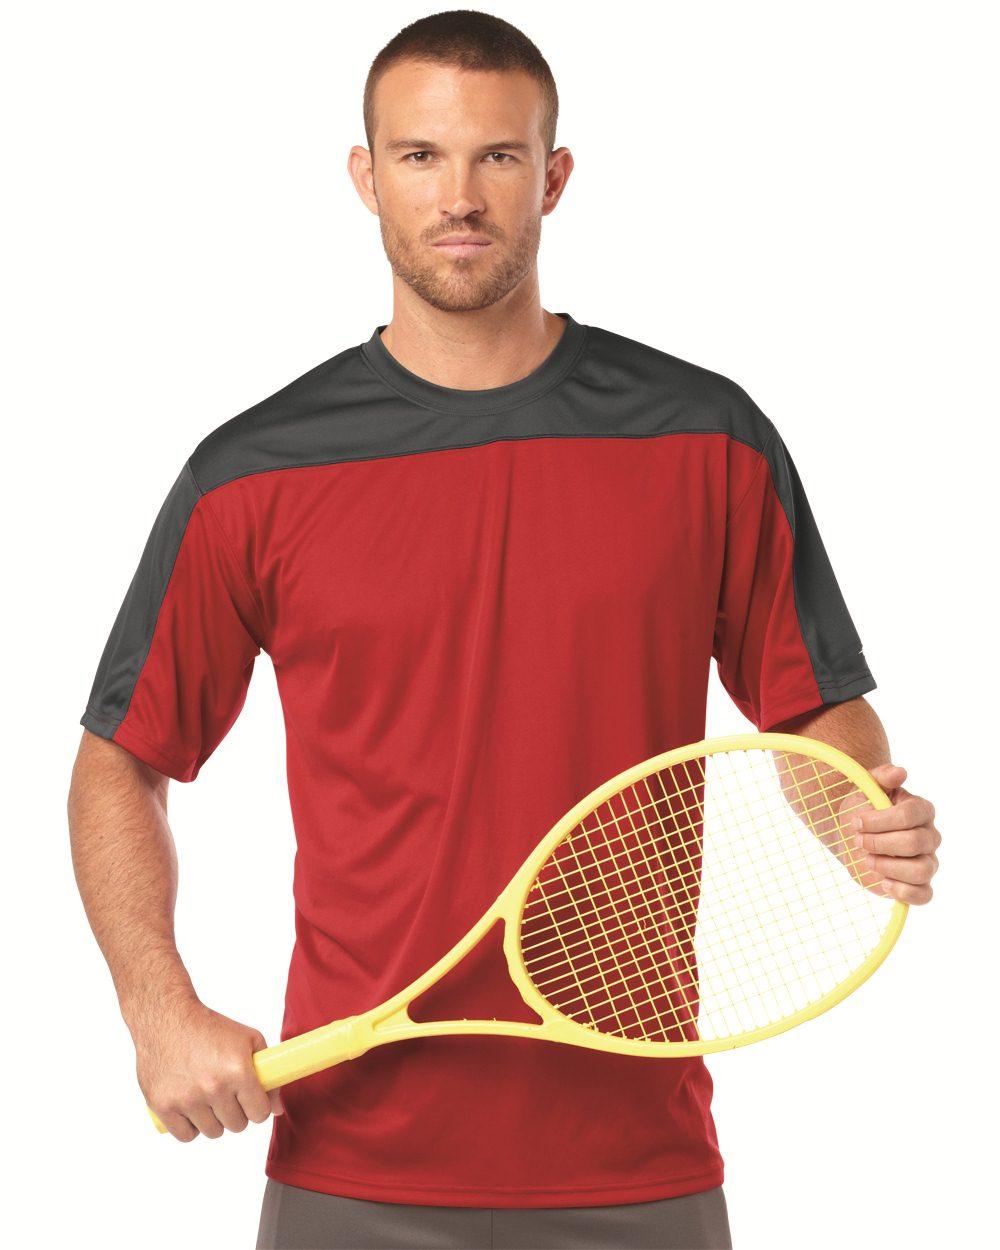 Badger 4149 - Defender B-Core Short Sleeve T-Shirt